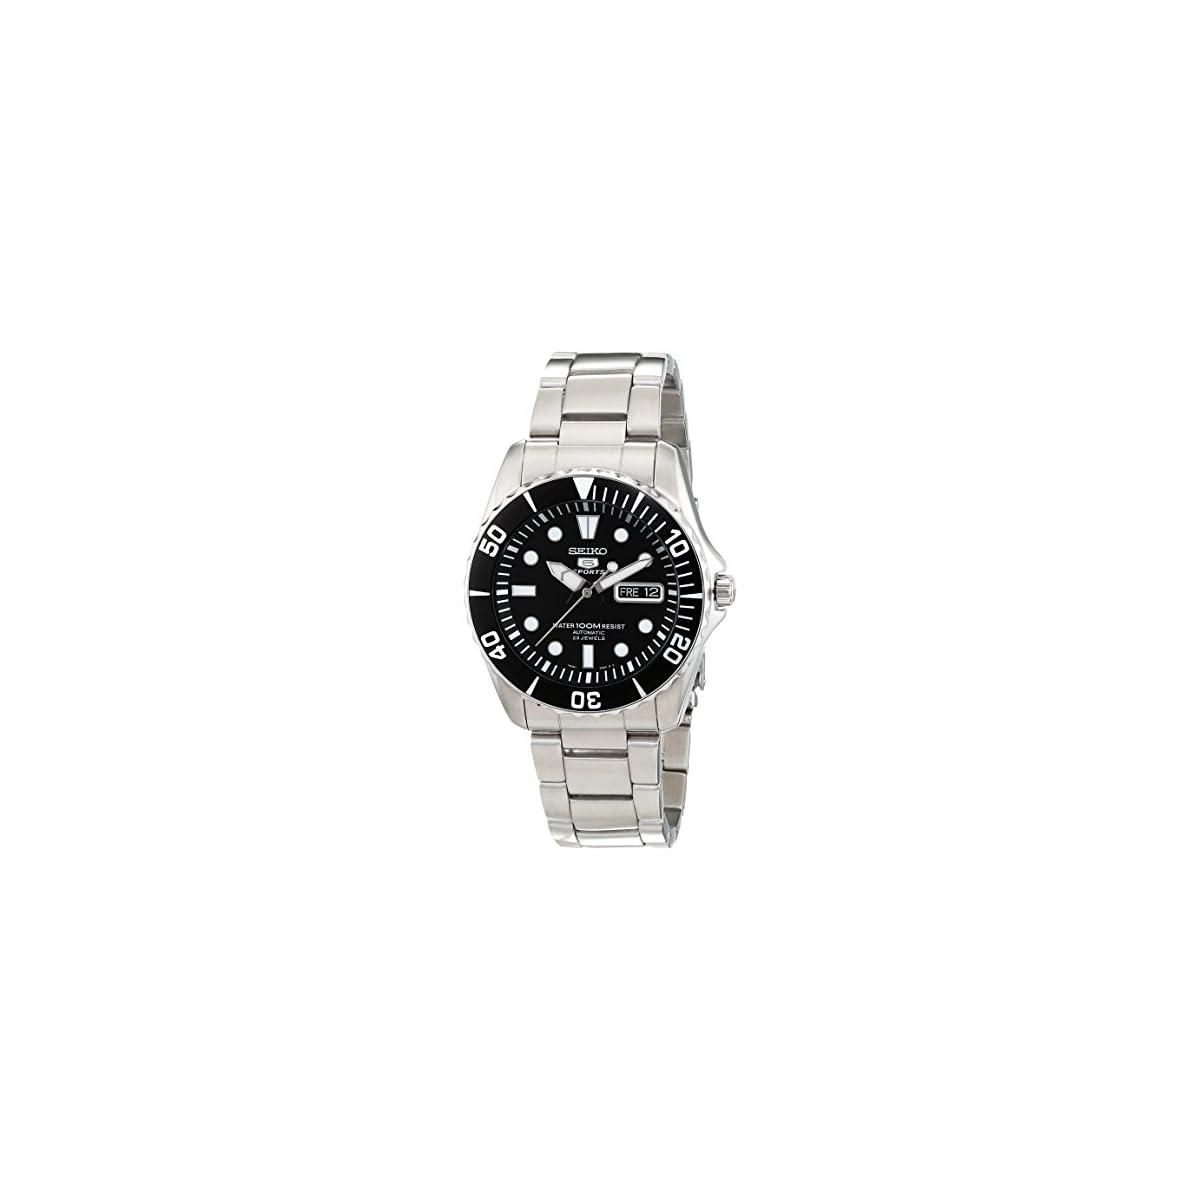 51XssAyZ8IL. SS1200  - Seiko Reloj Analógico Automático para Hombre con Correa de Acero Inoxidable - SNZF17K1